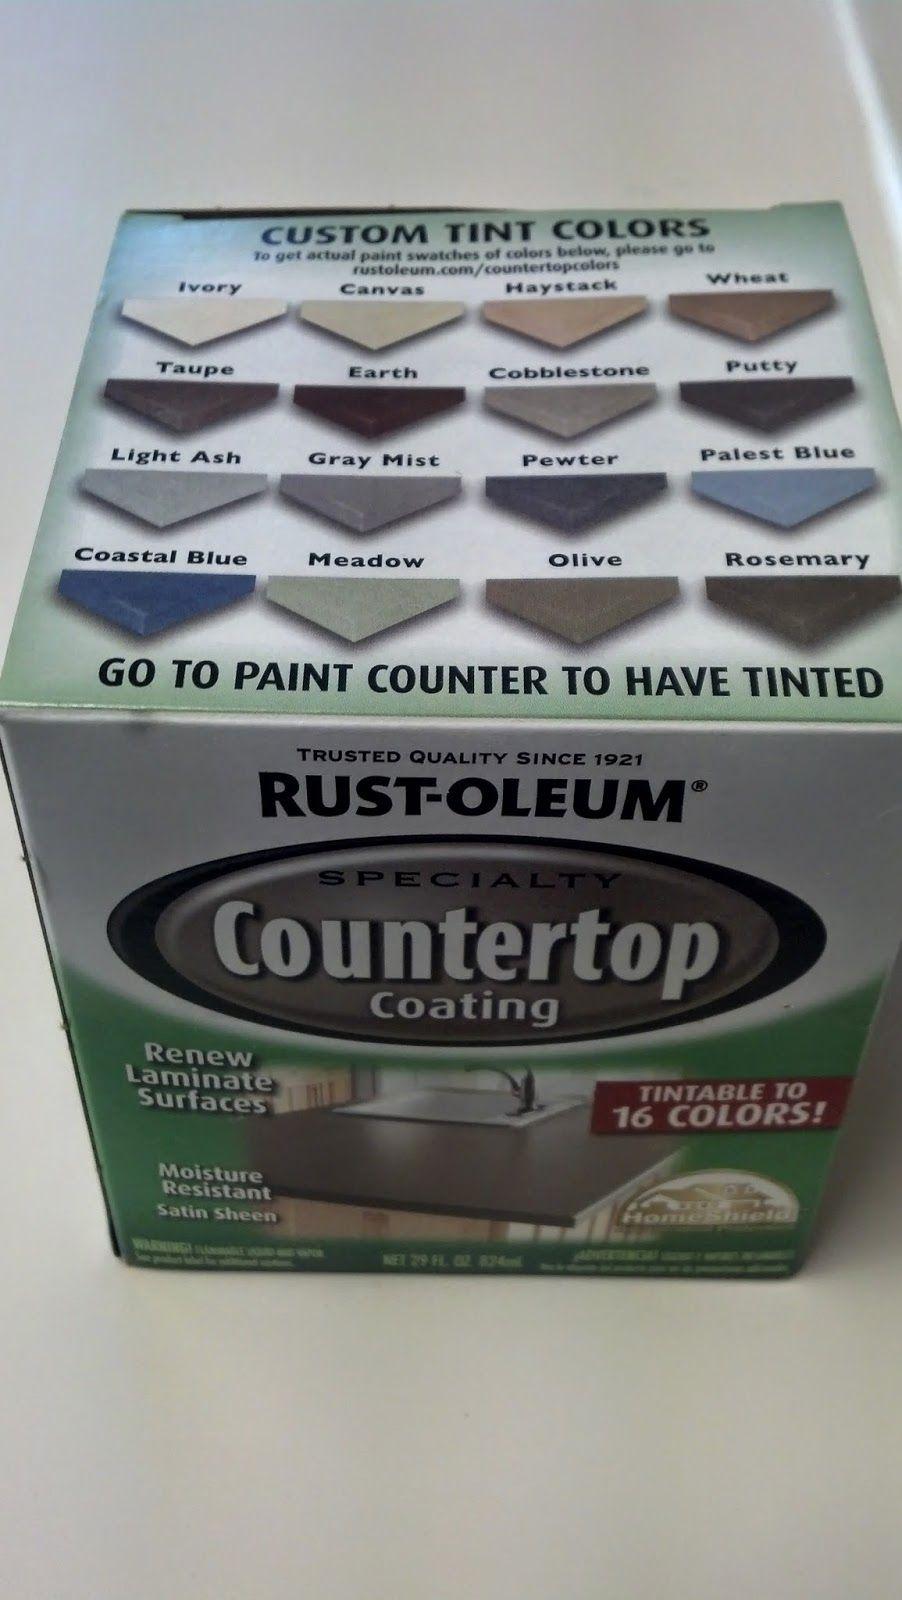 laminate kitchen countertops 13 Creative Bathroom Organization and DIY Solutions 12 Painting Bathroom CountertopsPaint Kitchen